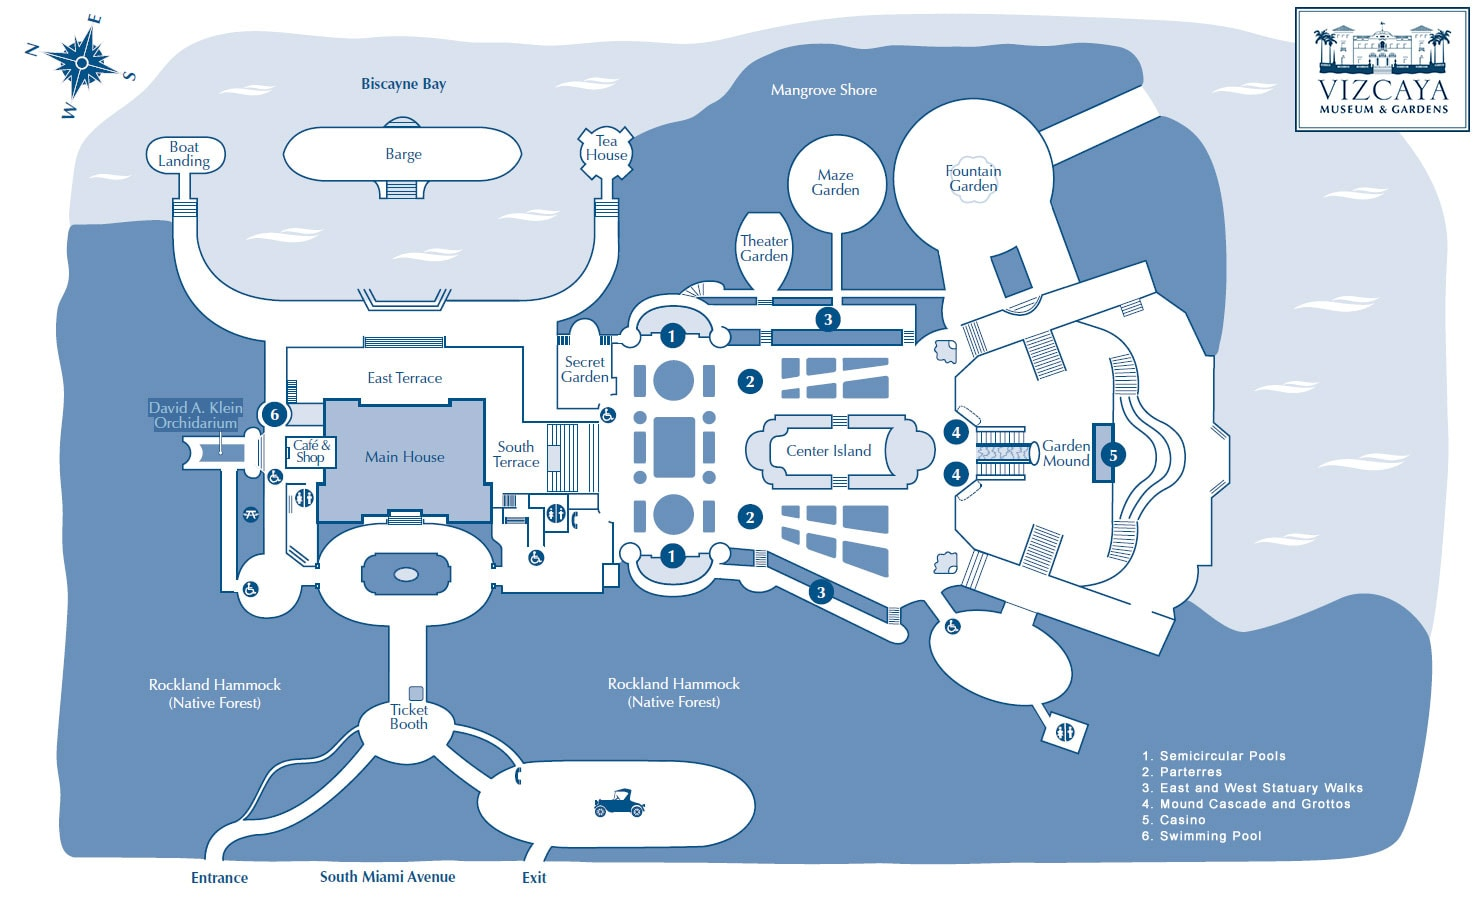 Karte, Map. Lageplan, Vizcaya Museum & Gardens, Reisebericht